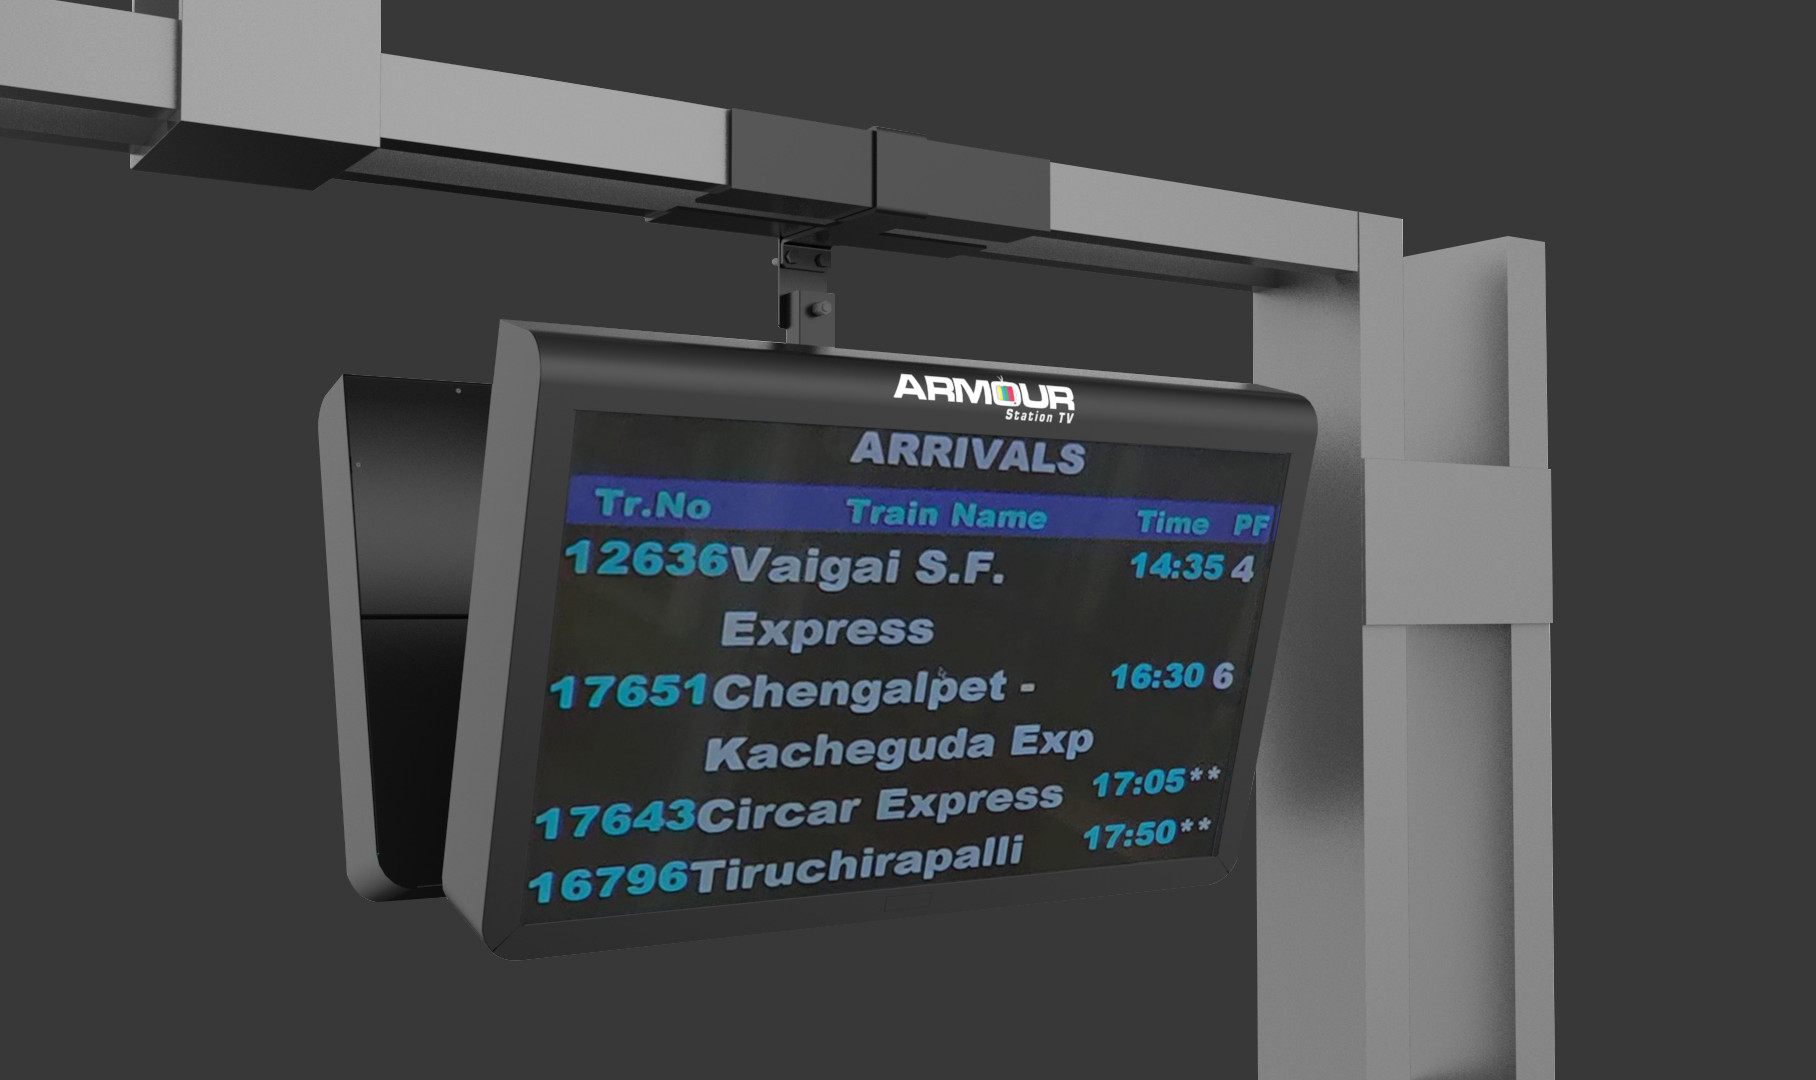 Armour Digital